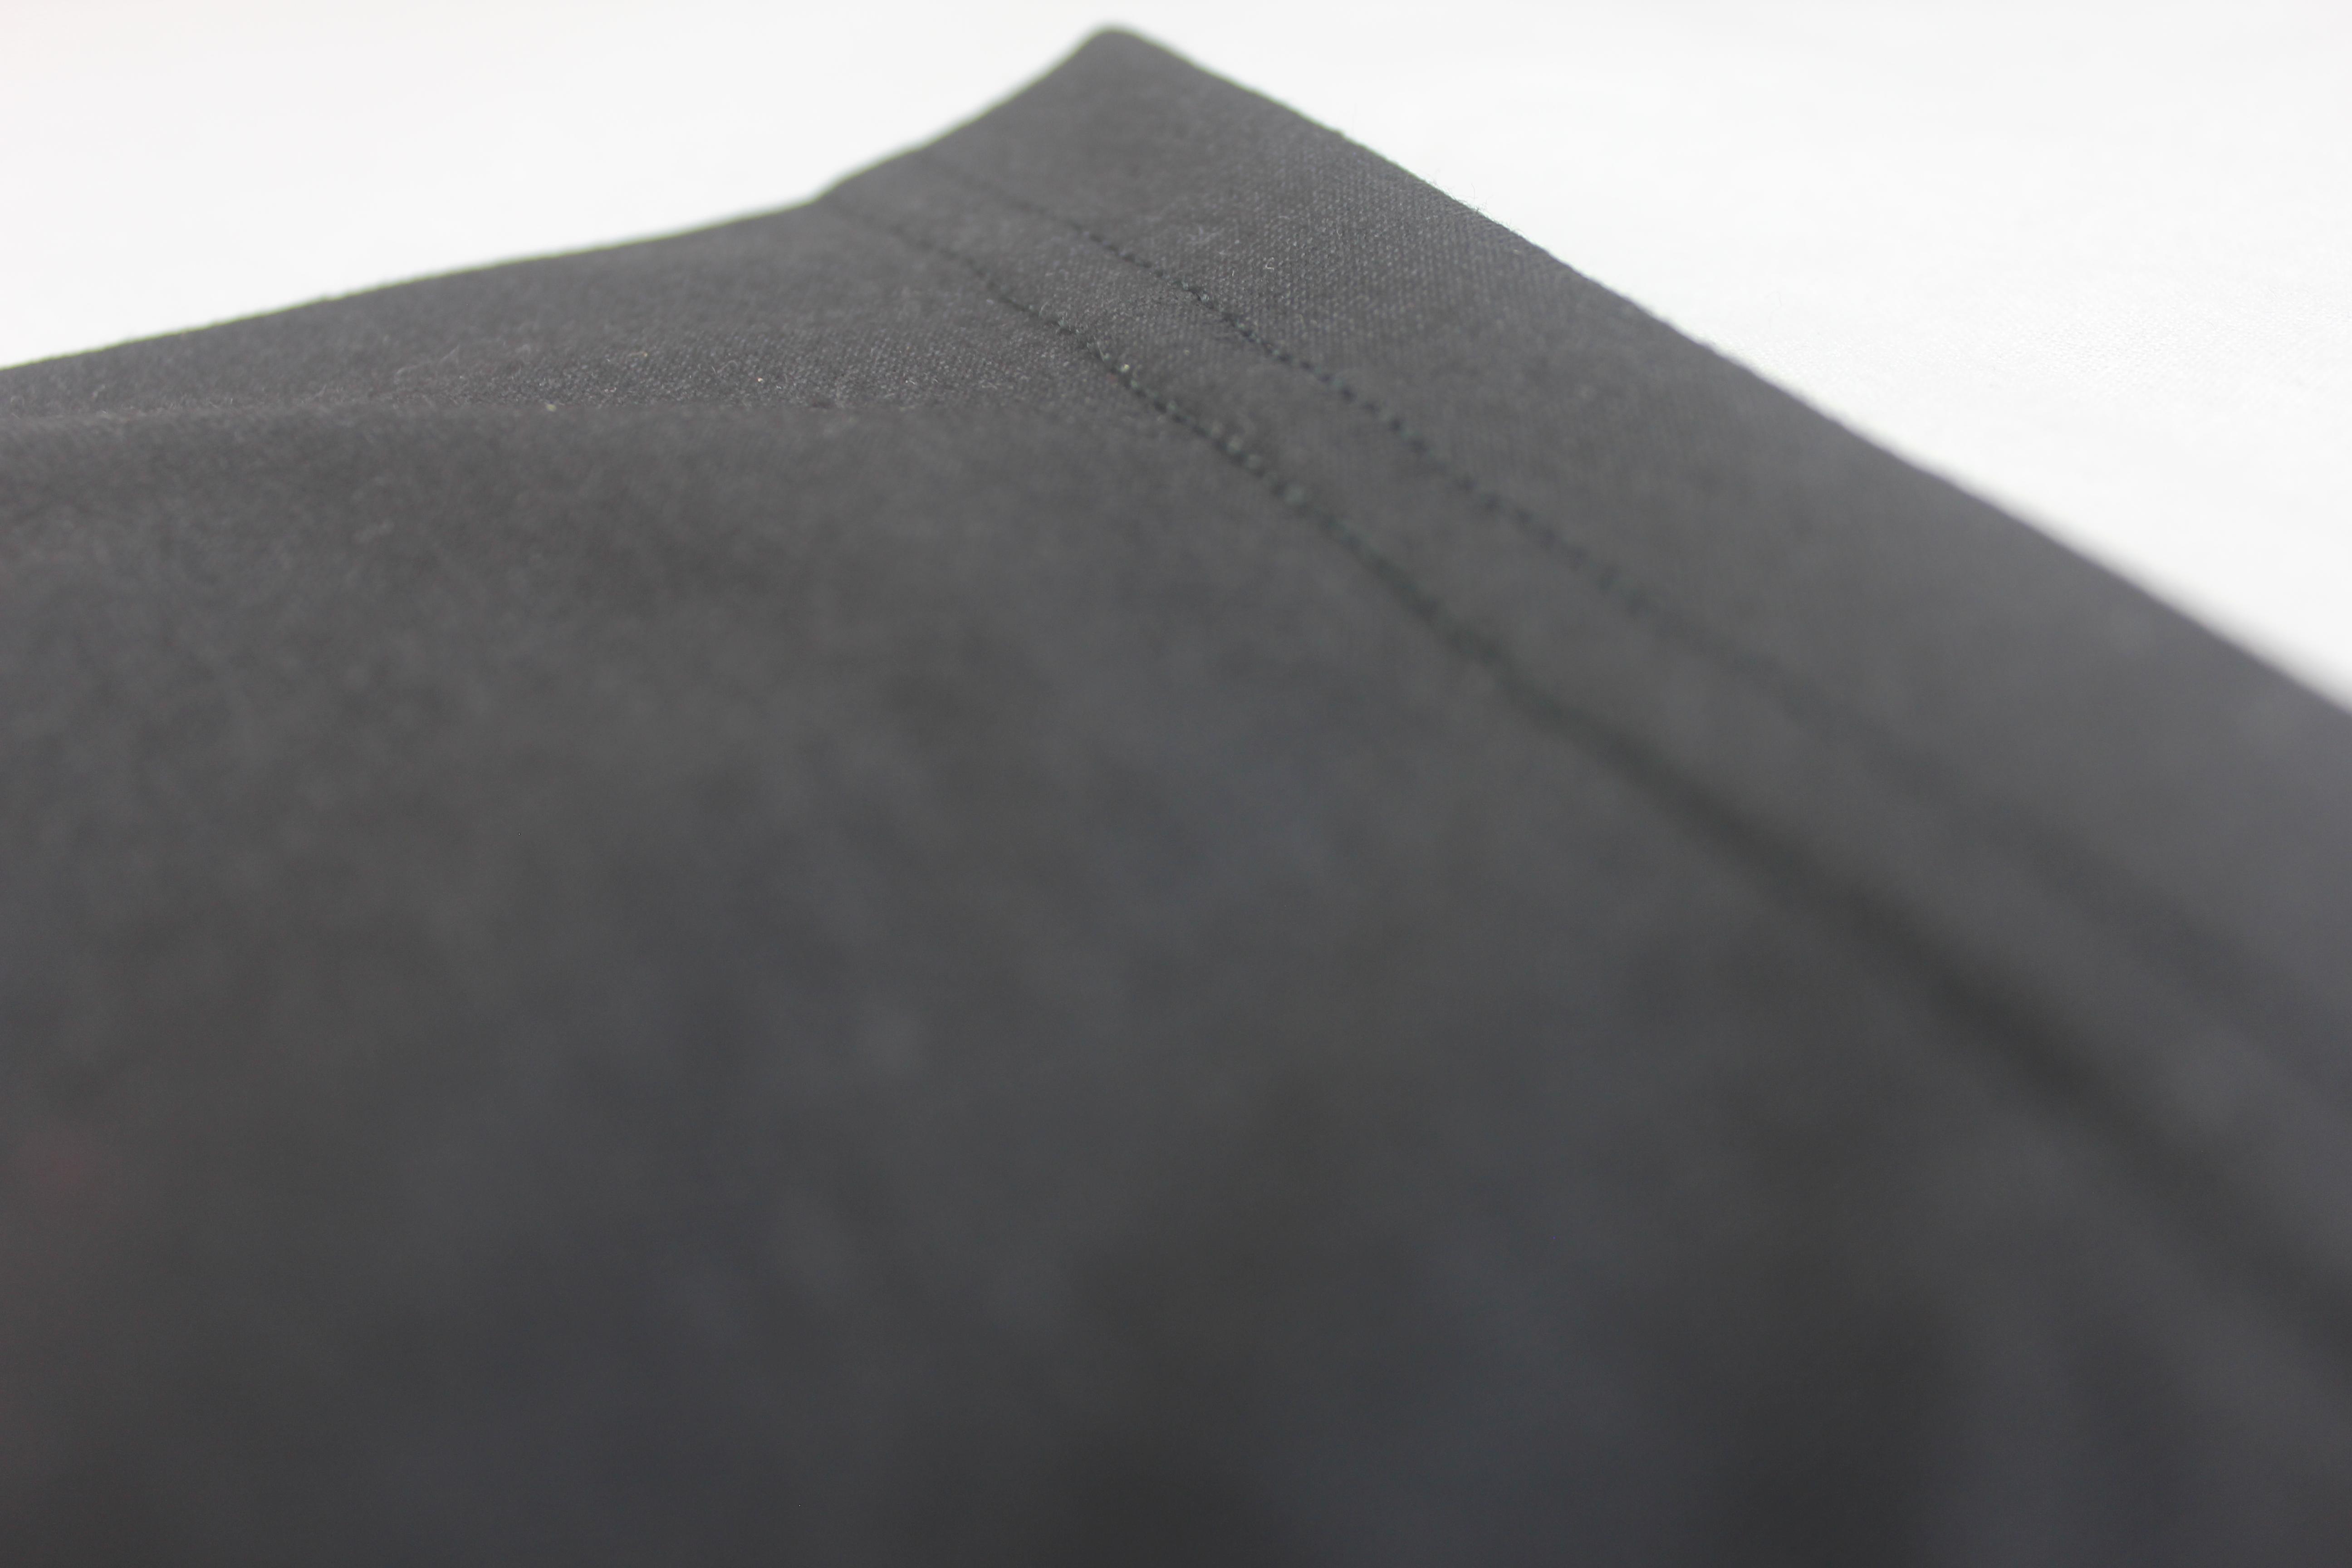 Quality stitching